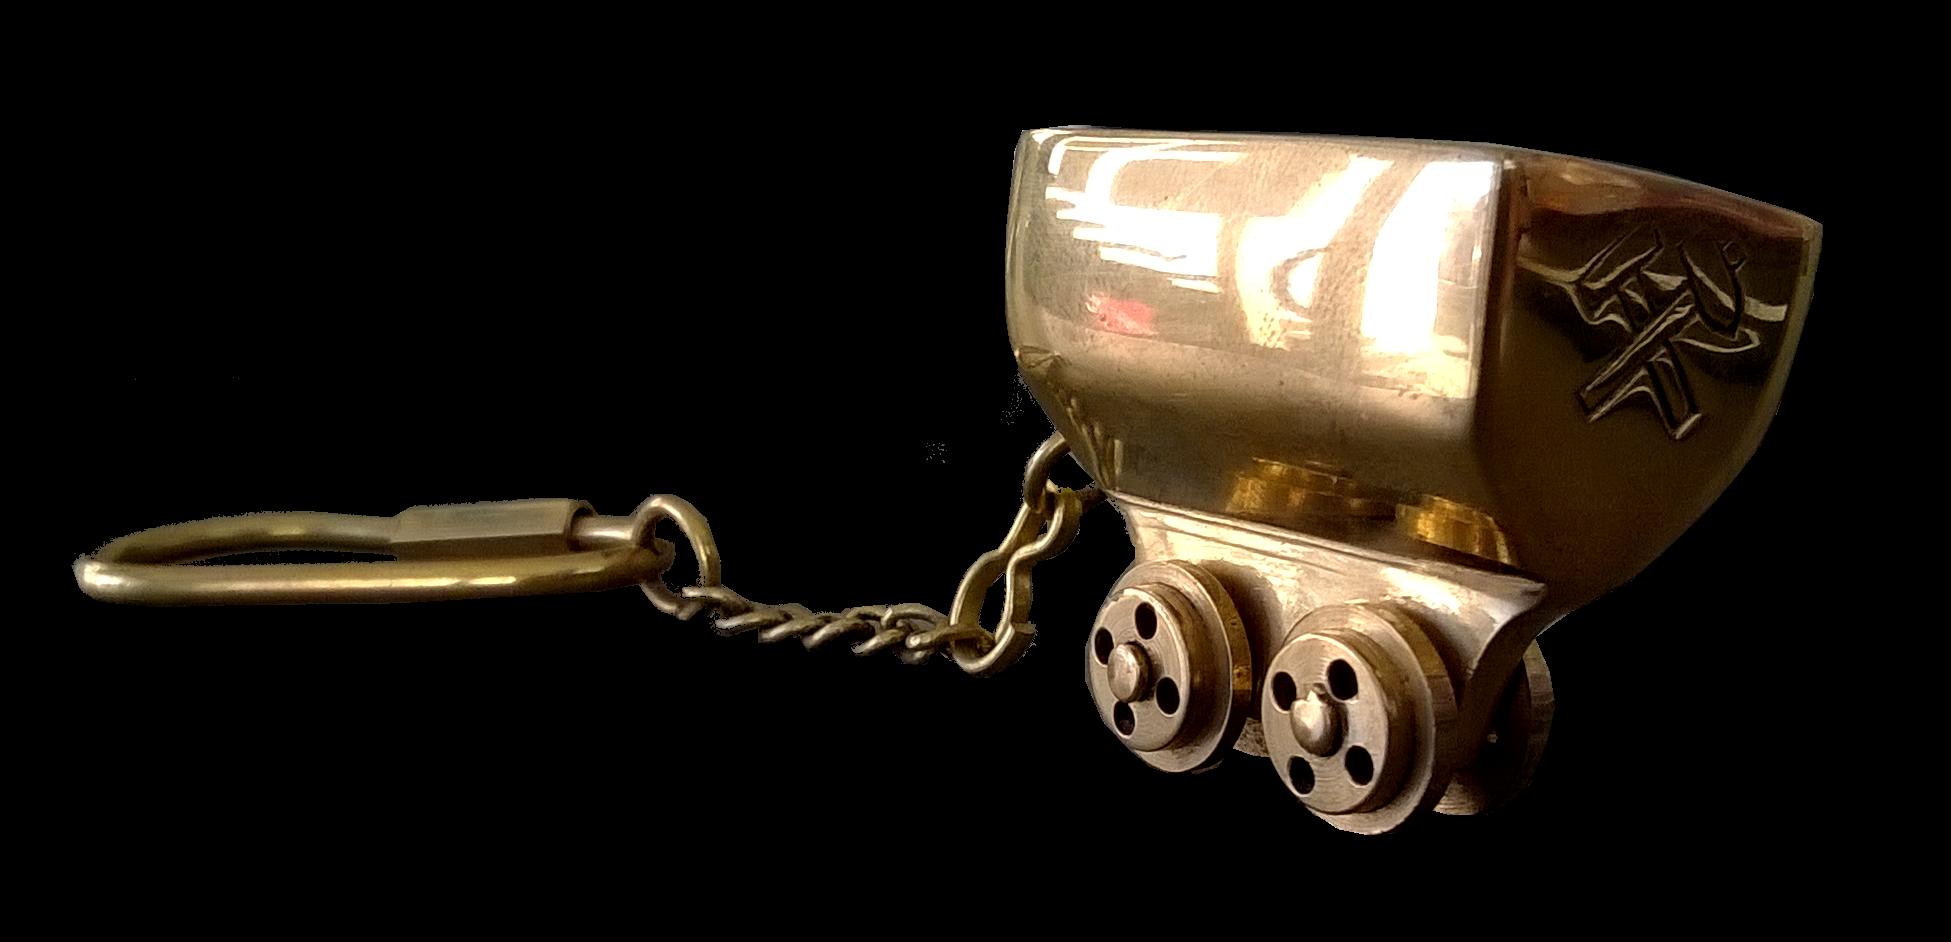 Porte-clefs wagonnet